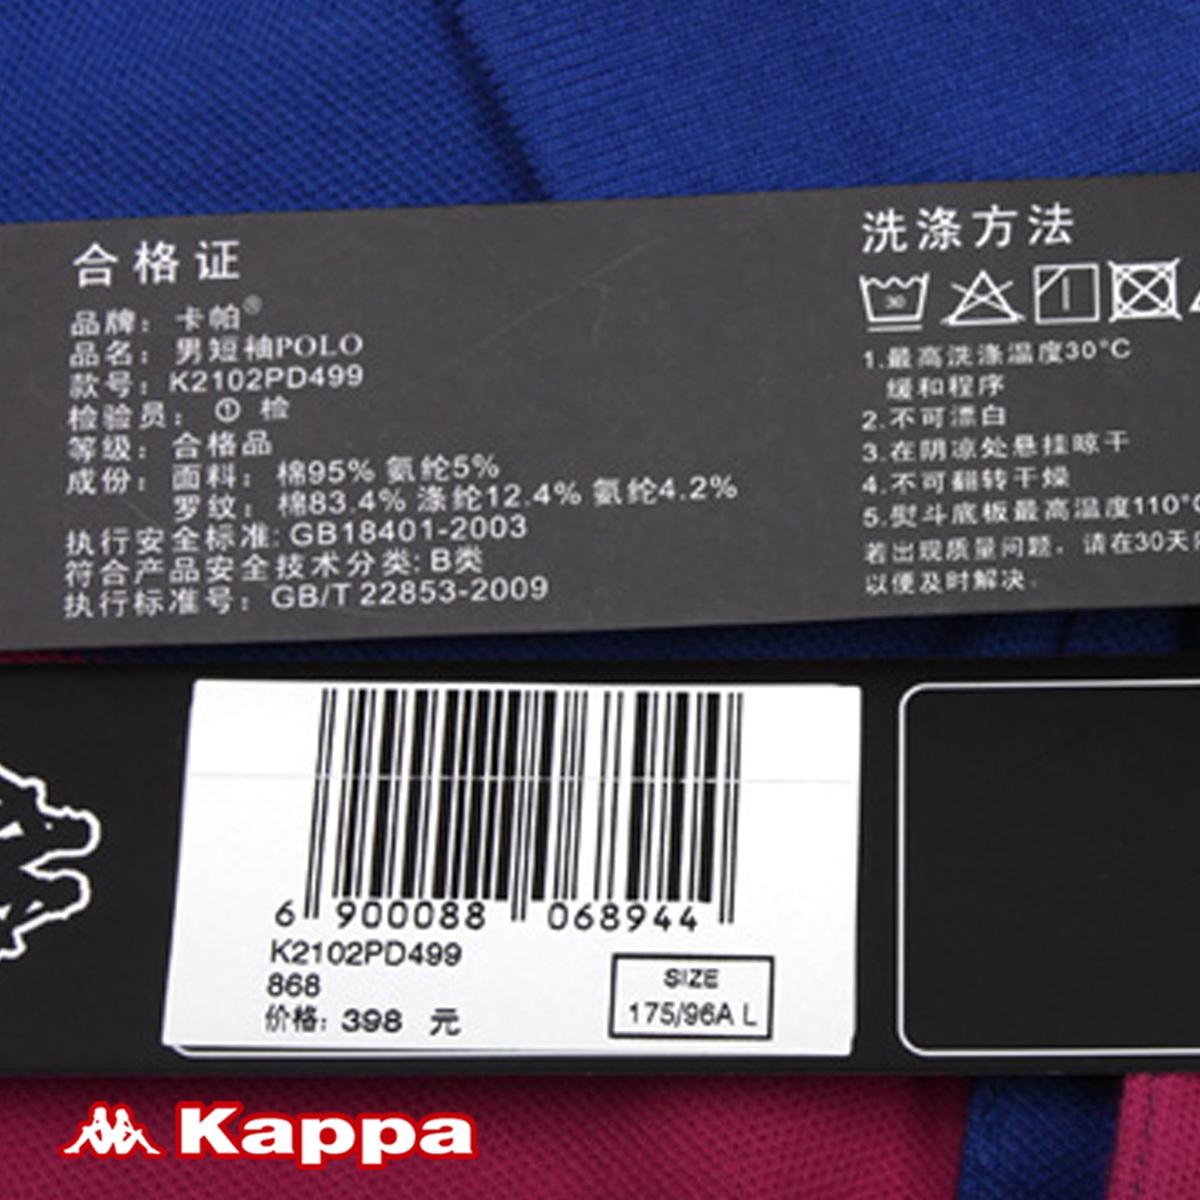 Спортивная футболка KAPPA K2102PD499 /868 POLO K2102PD499-868 Отложной воротник Короткие рукава ( ≧35cm ) Логотип бренда